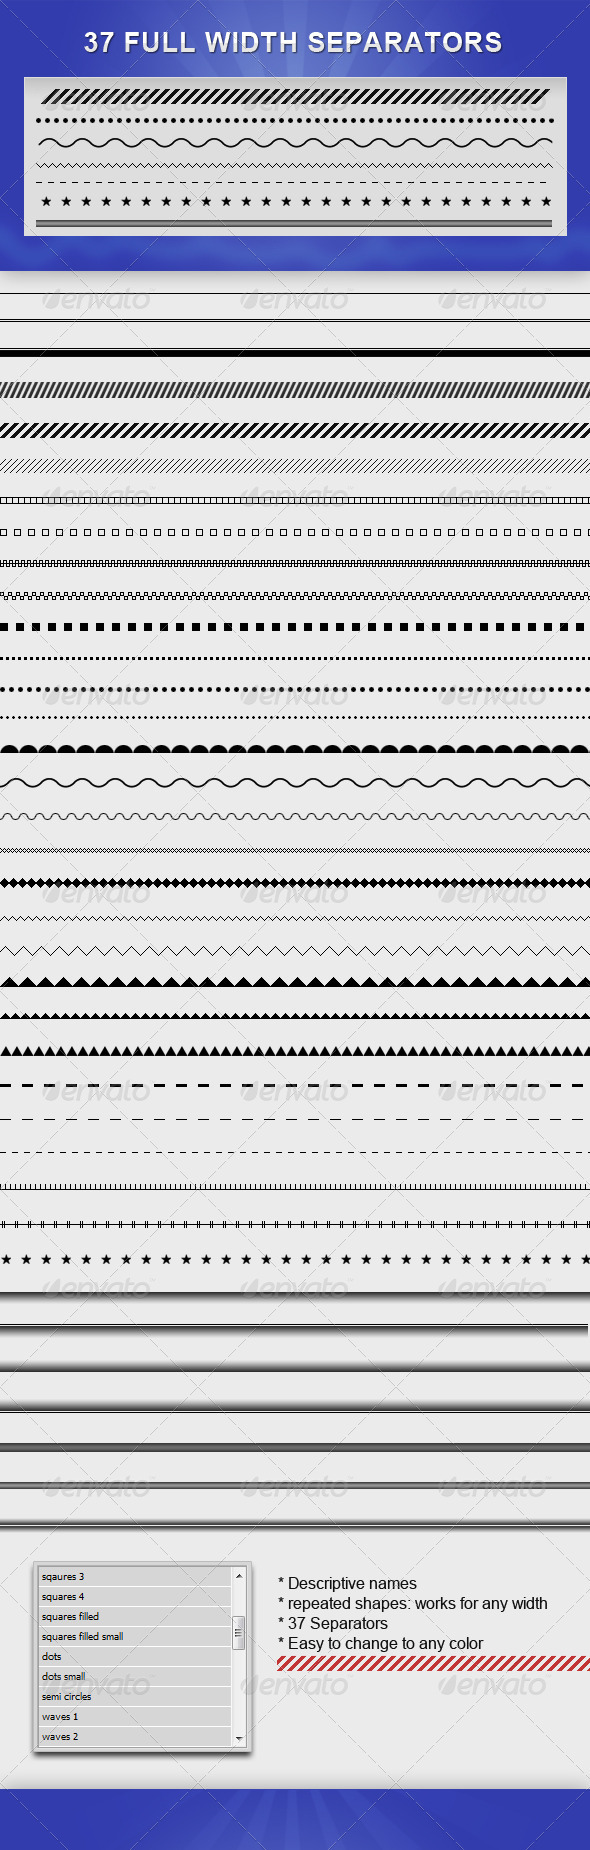 GraphicRiver Full Width Separators Pack 2261651